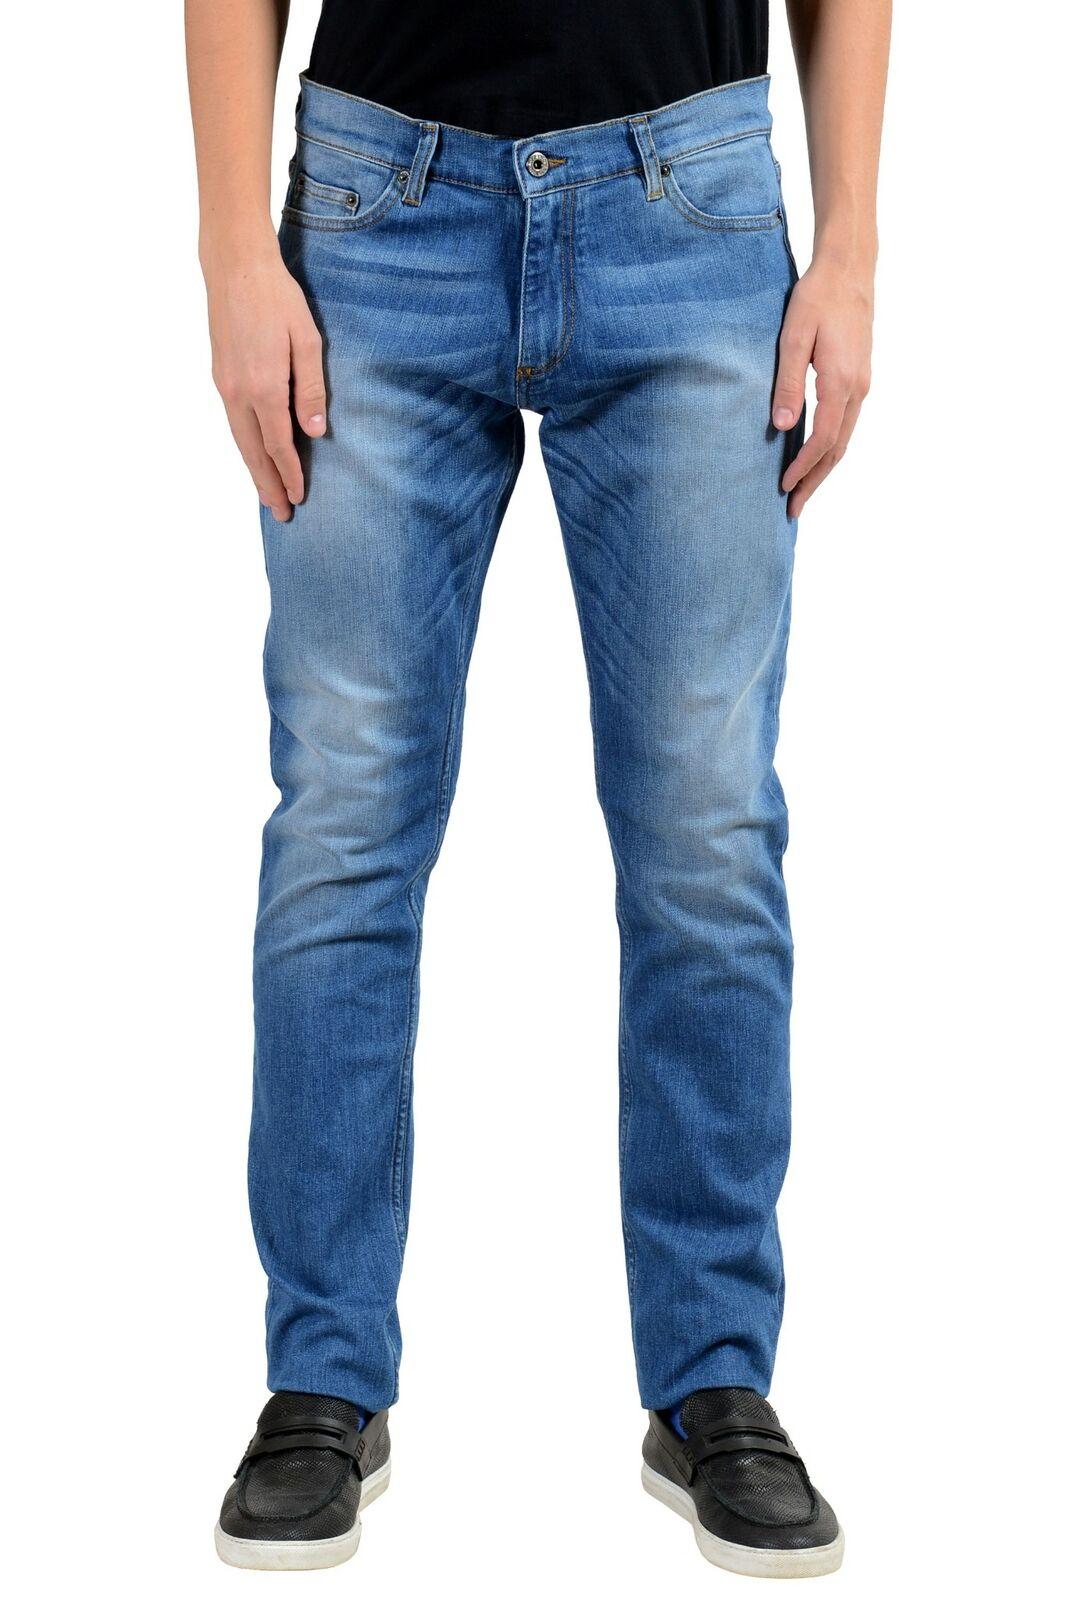 Roberto Cavalli Men's bluee Stretch Slim Jeans Size 34 36 38